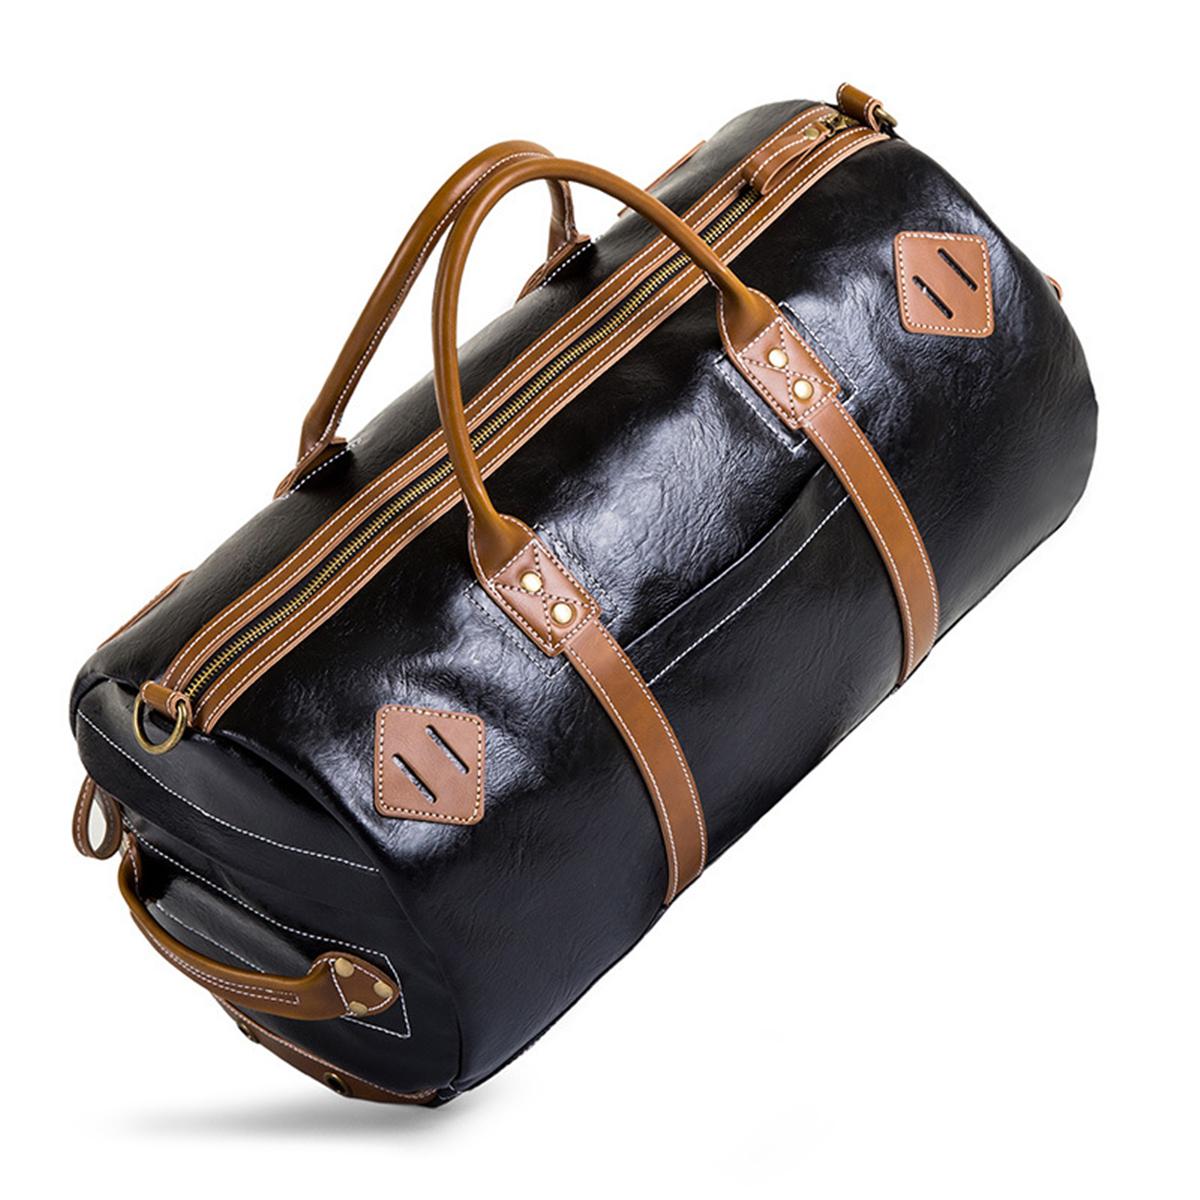 73ab0234f349 28L Men PU Leather Handbag Shoulder Bag Duffle Gym Tote Bag Sports Tra..